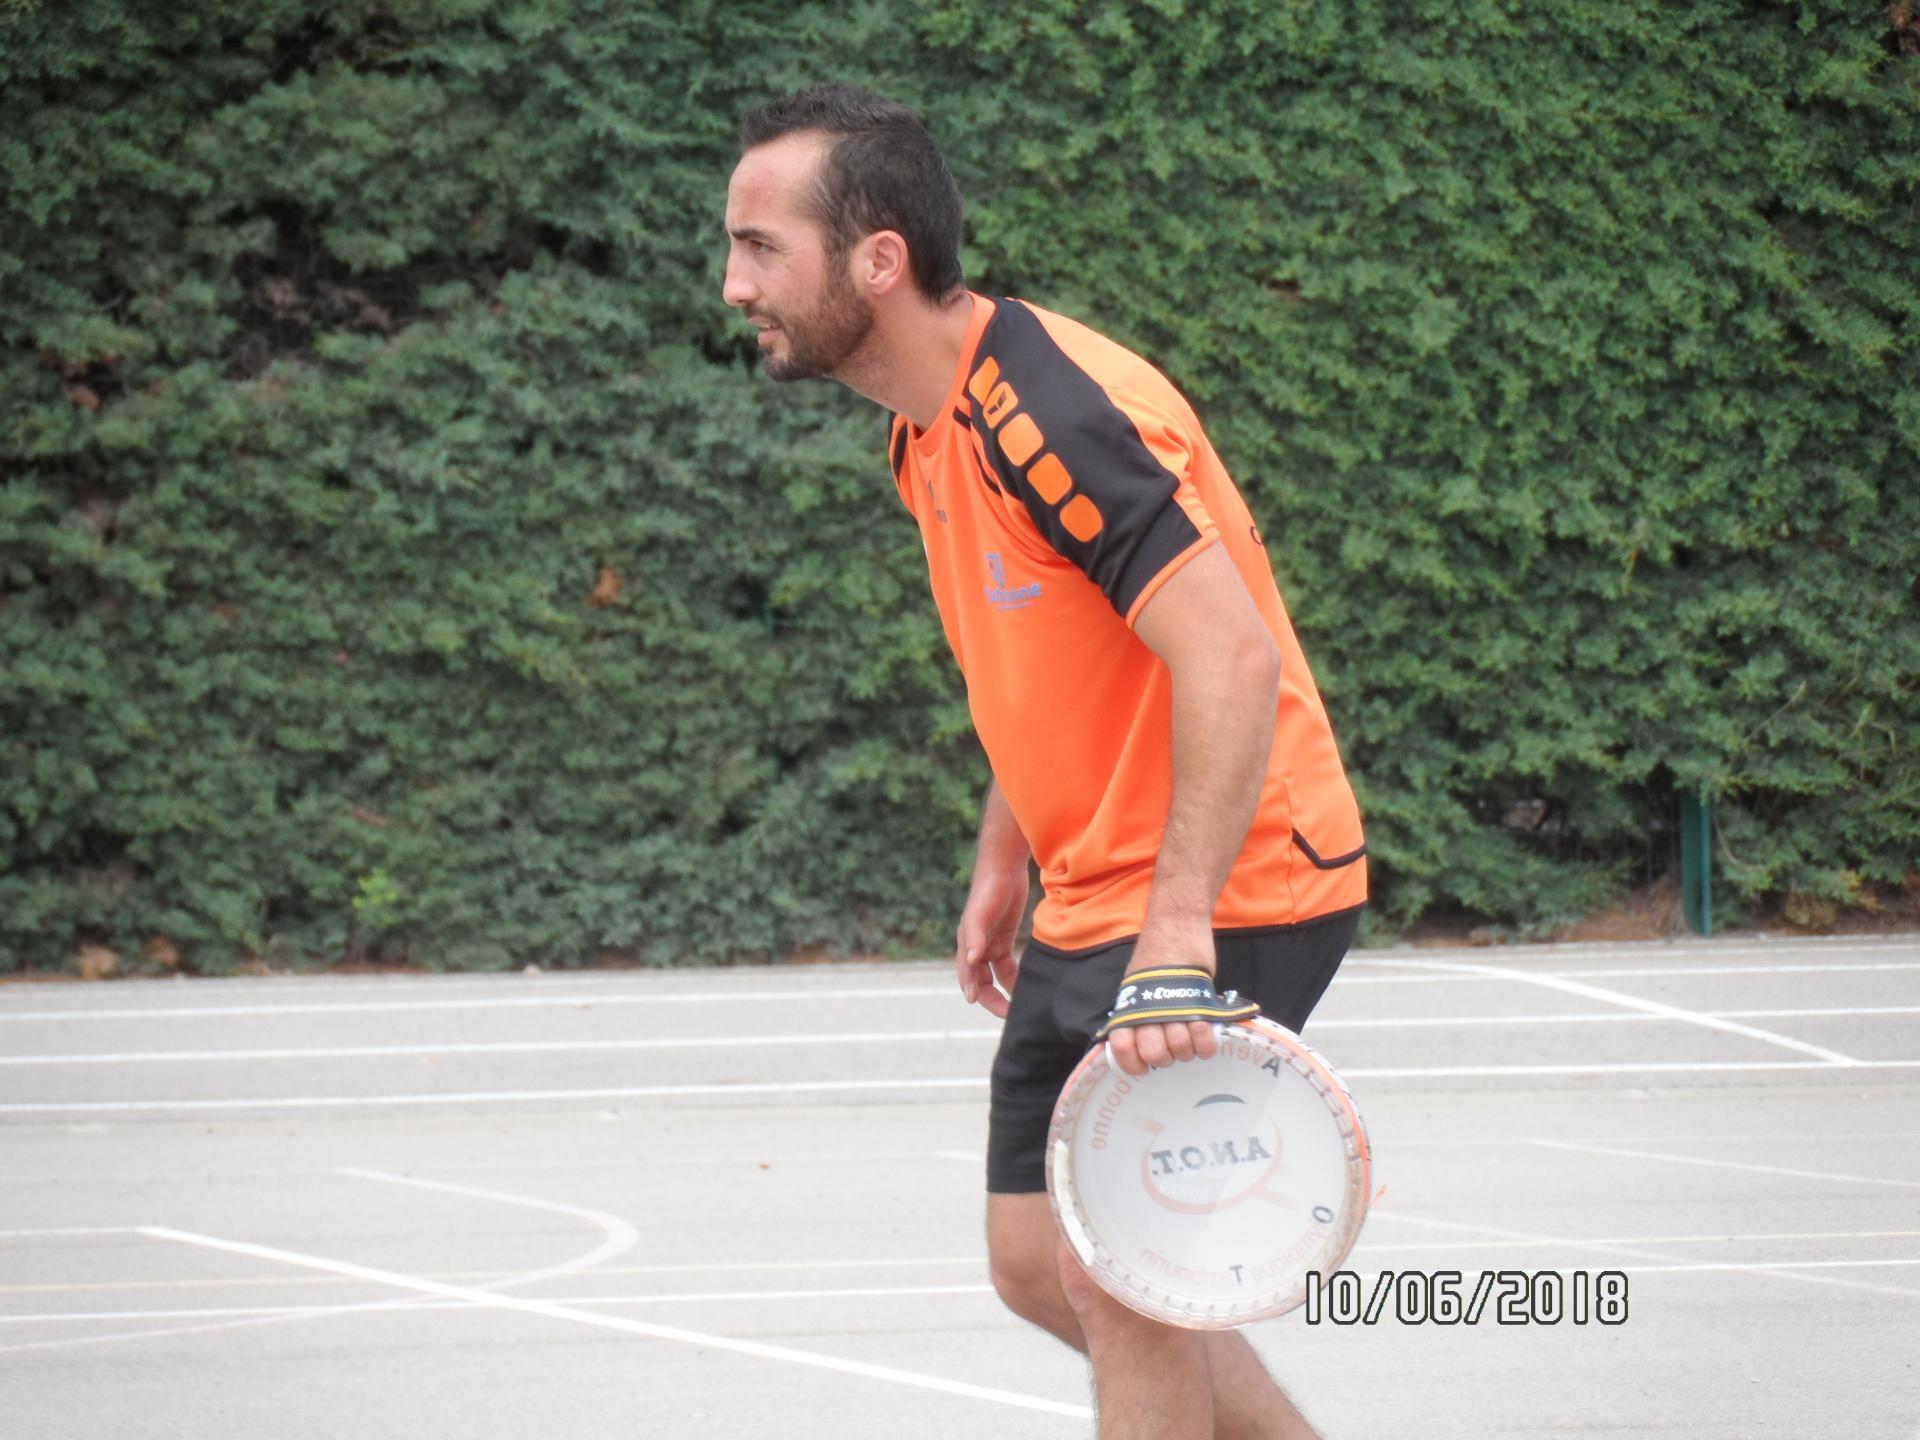 Guillaume Agullo